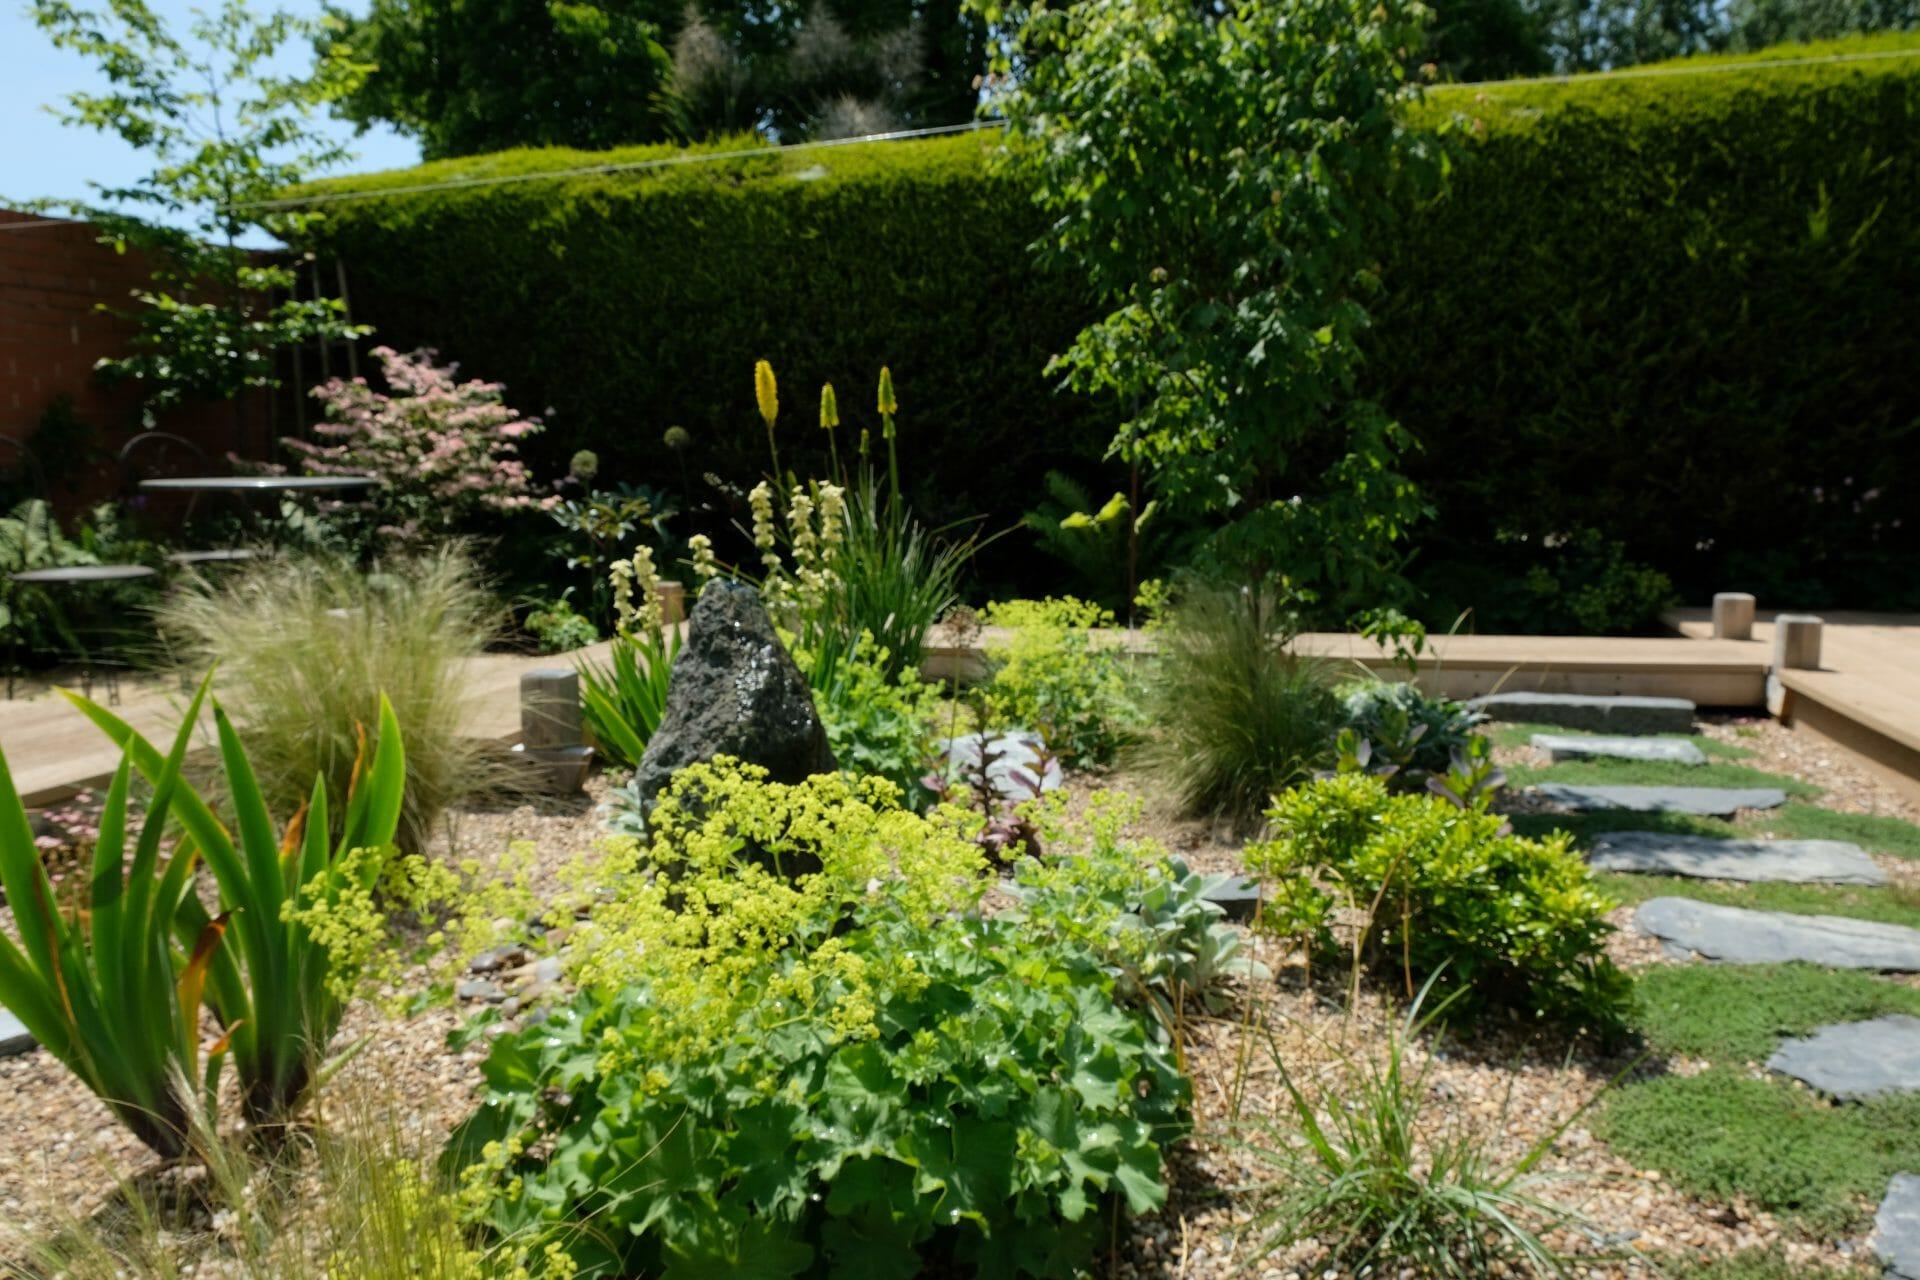 Sensory Garden Chepstow